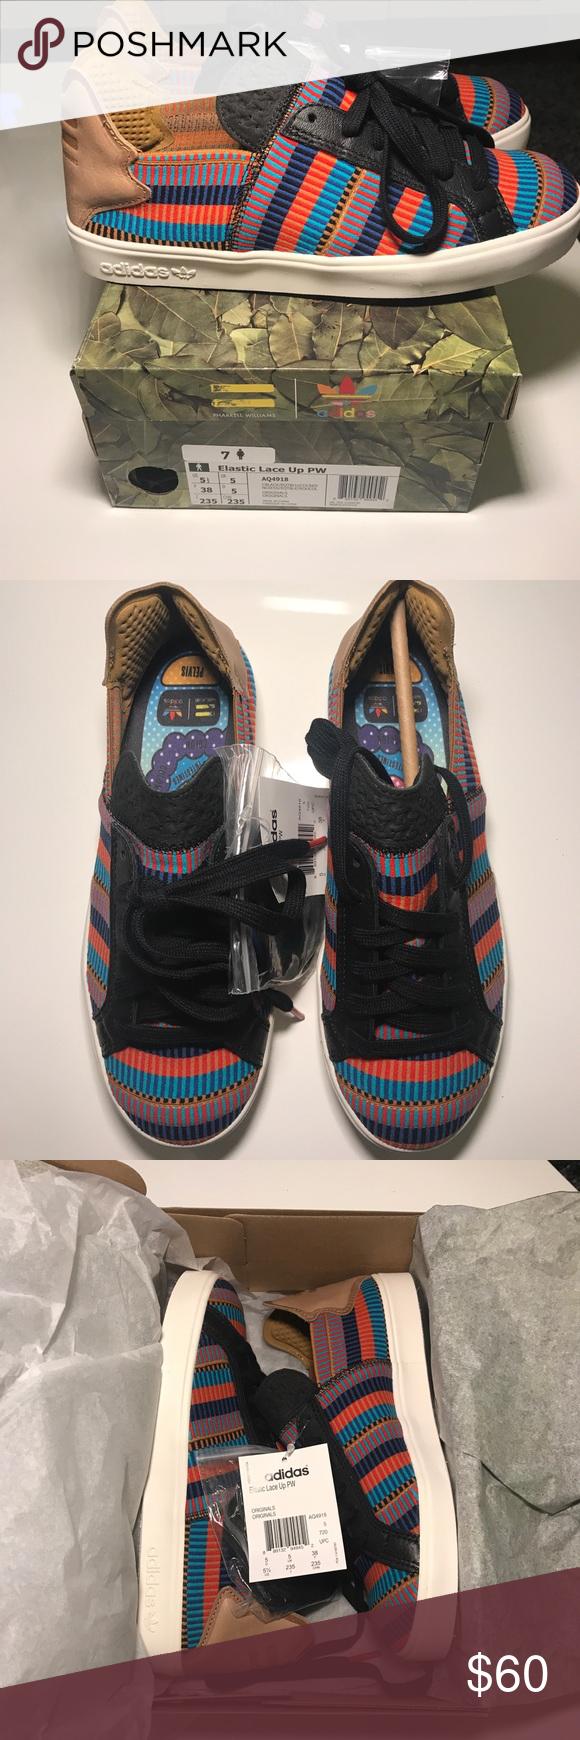 4b9c5e337a5b Adidas X Pharrell Williams NWT Adidas Consortium X Pharrell Williams  Elastic Lace Up Sneaker - Pink